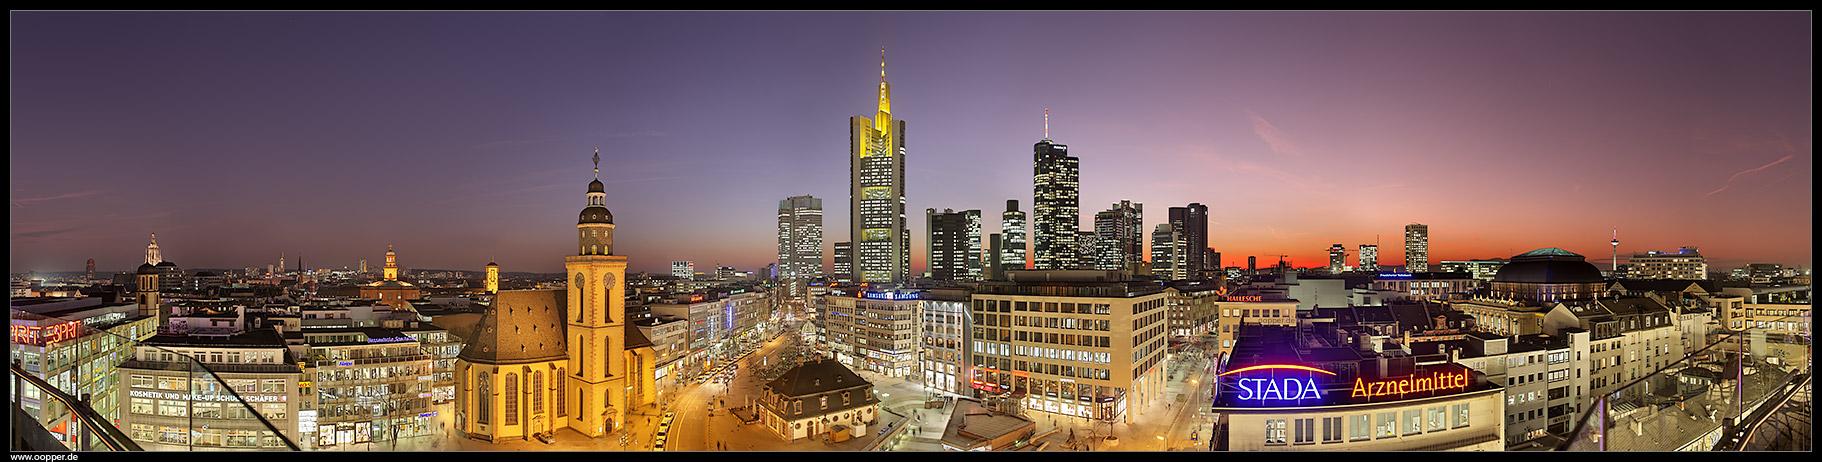 "Fotoausstellung ""Panorama Frankfurt"""